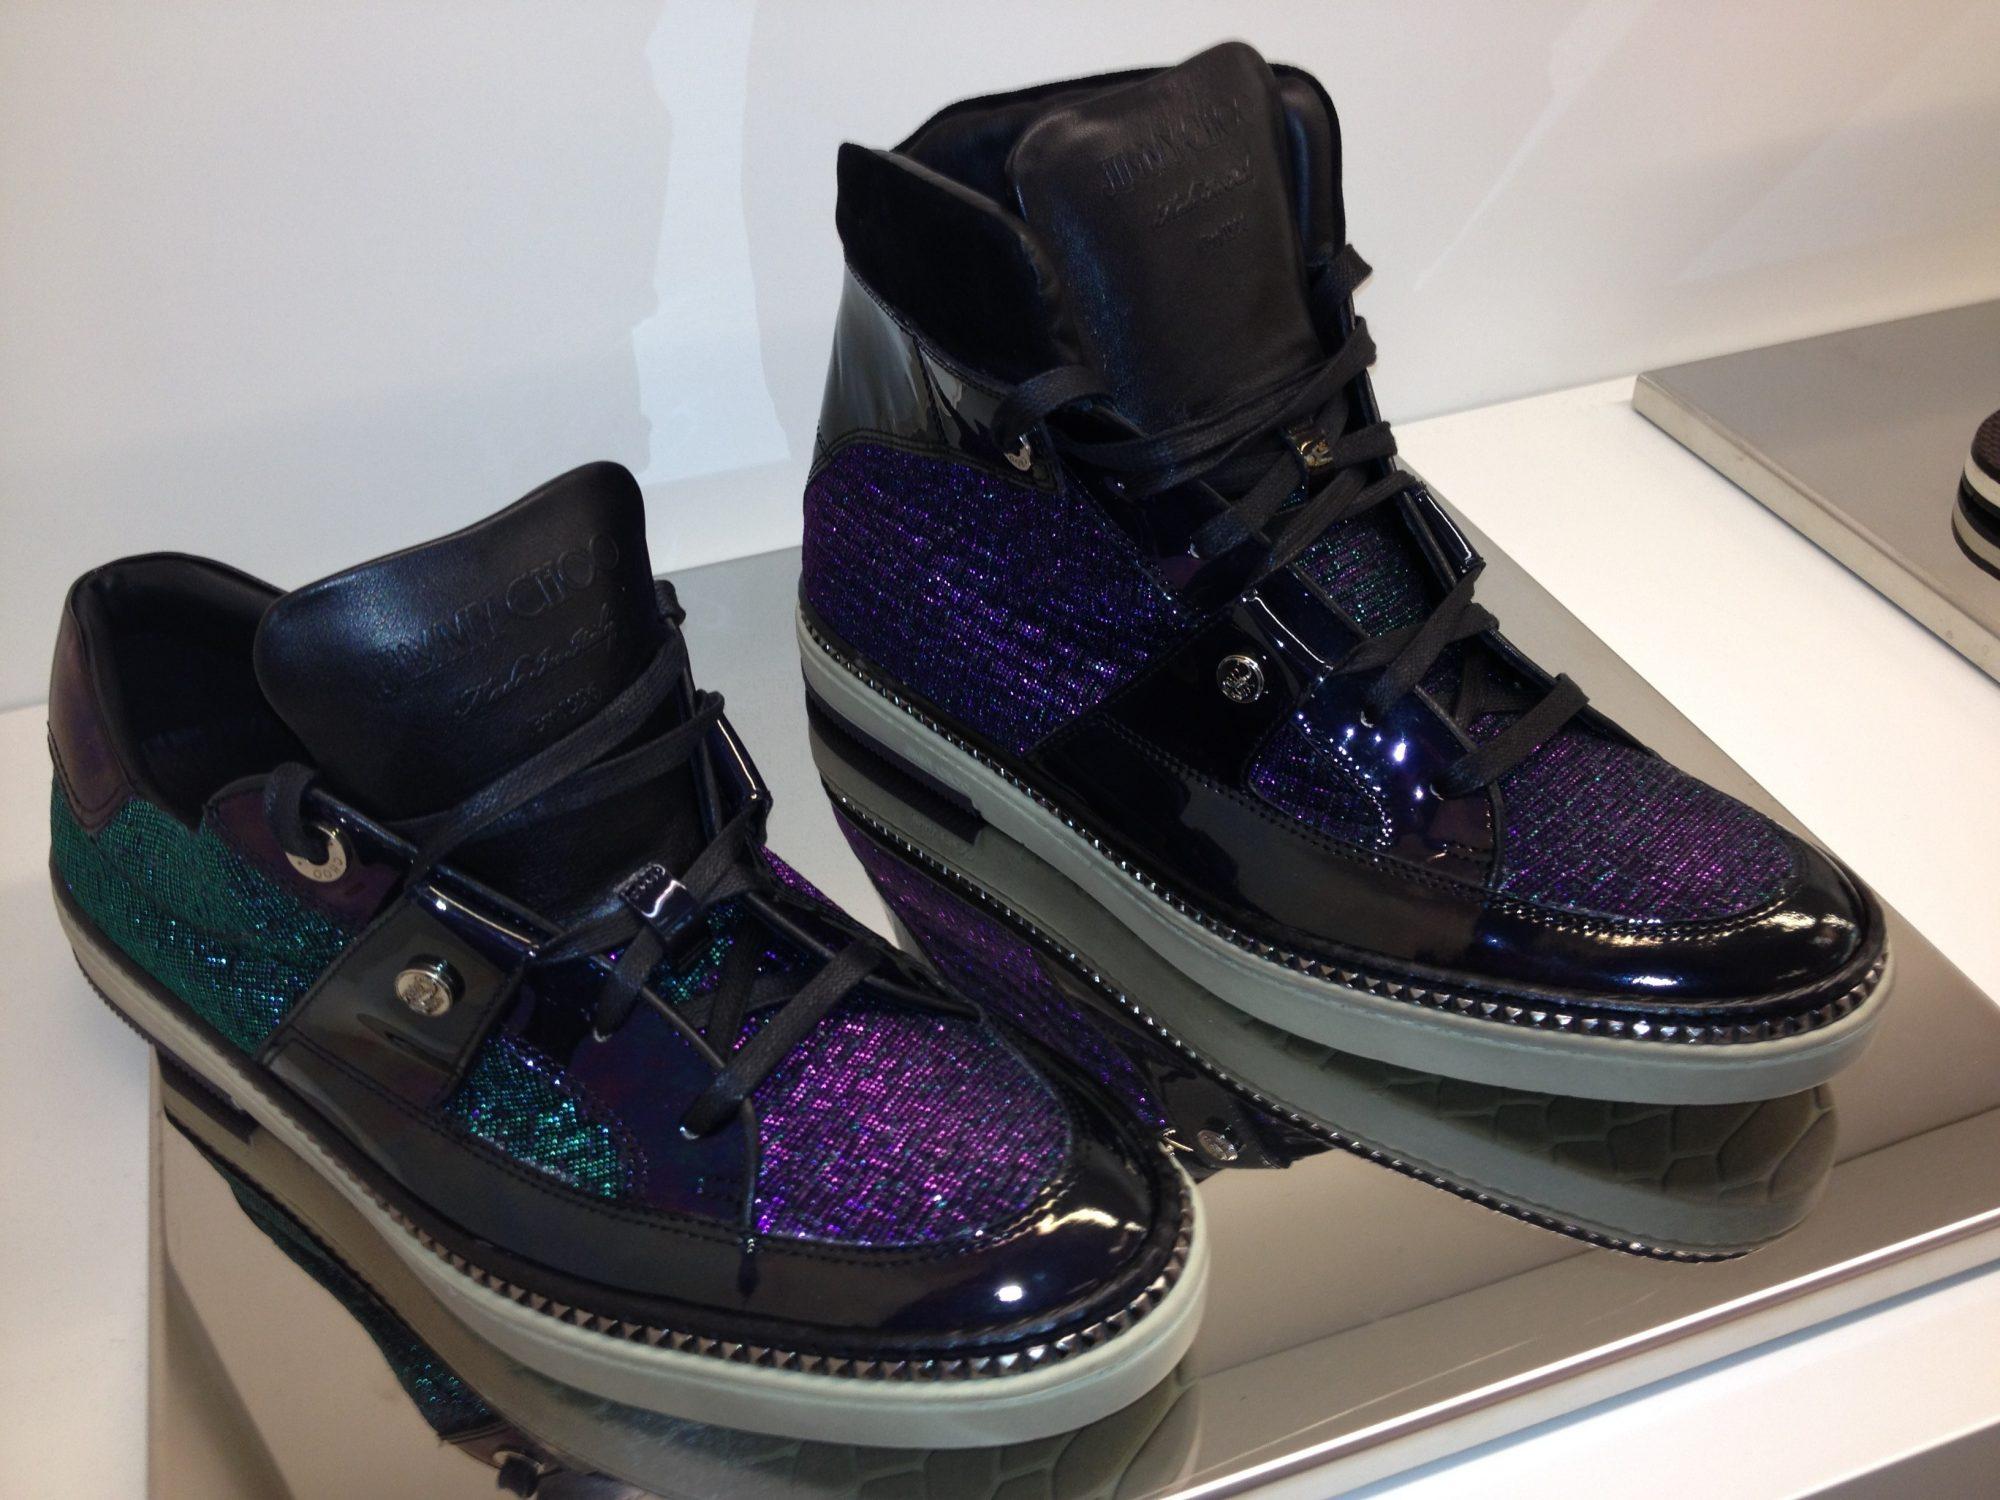 Jimmy-Choo-Mens-Cruise-2014-Belgravia-Portman-Holographic-Hologram-Hi-top-Trainer-Sneaker